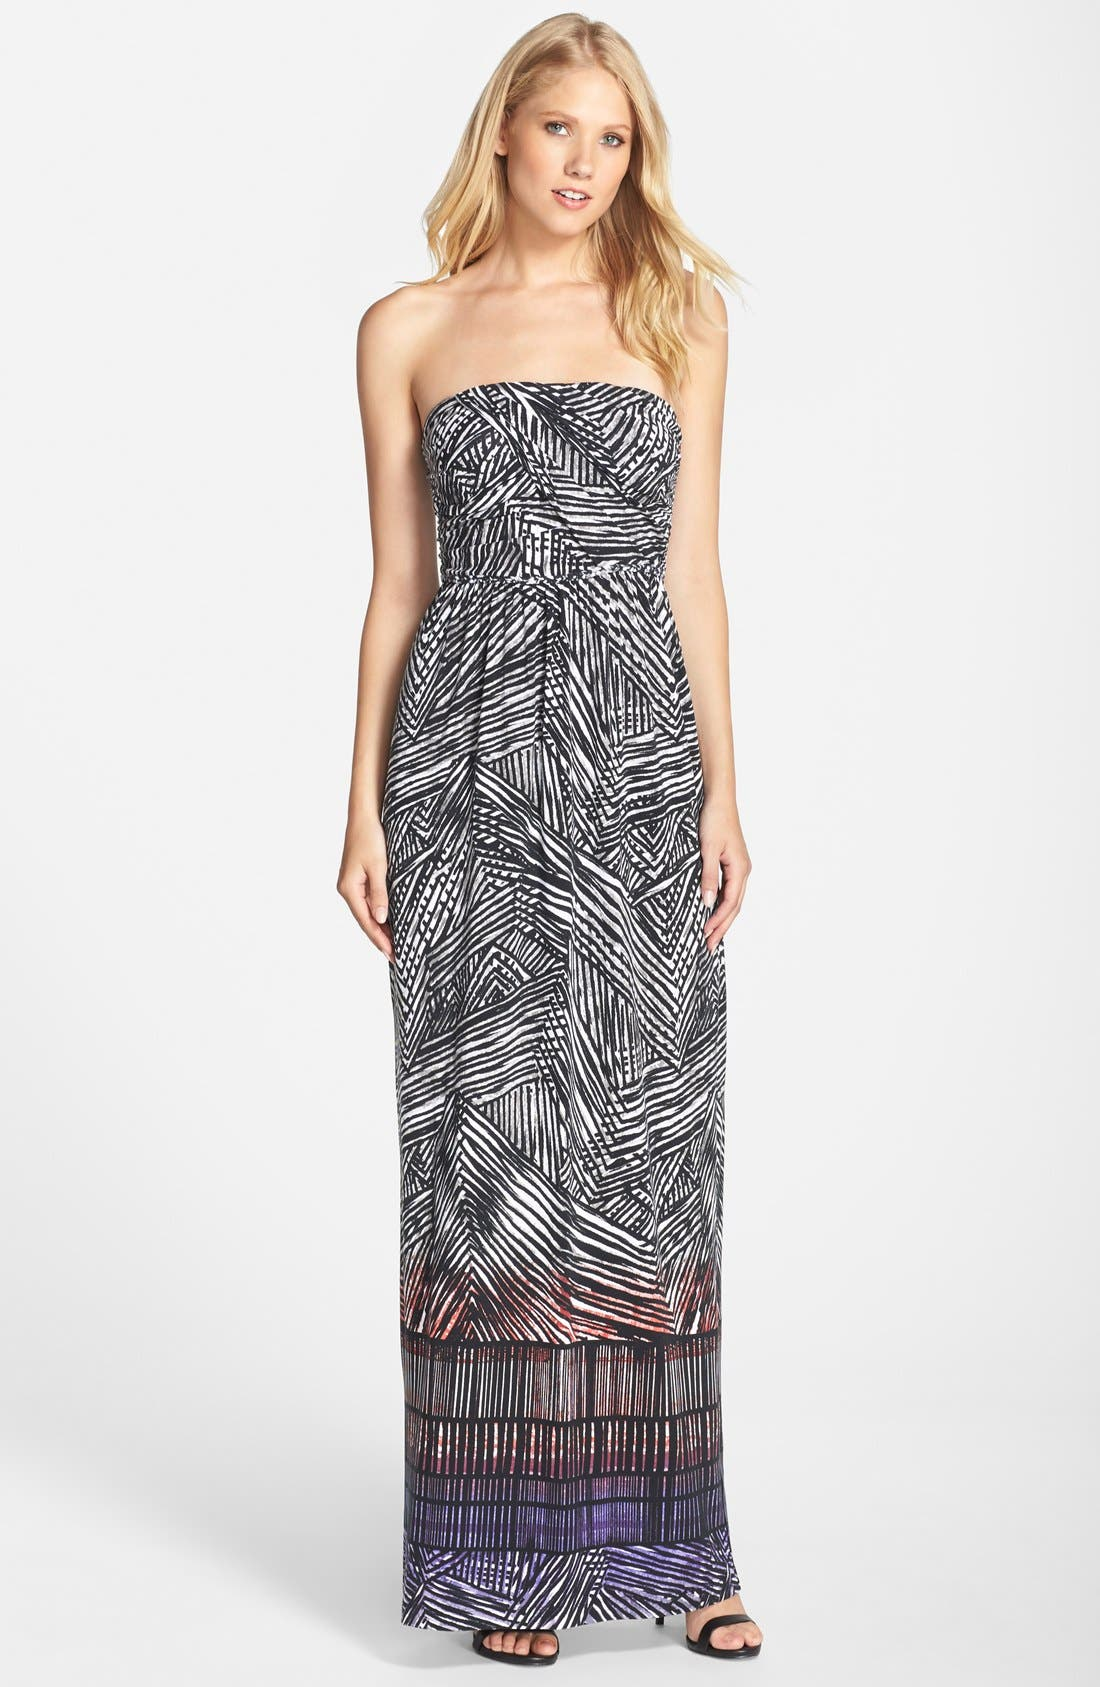 Main Image - Tart 'Delancy' Print Jersey Maxi Dress